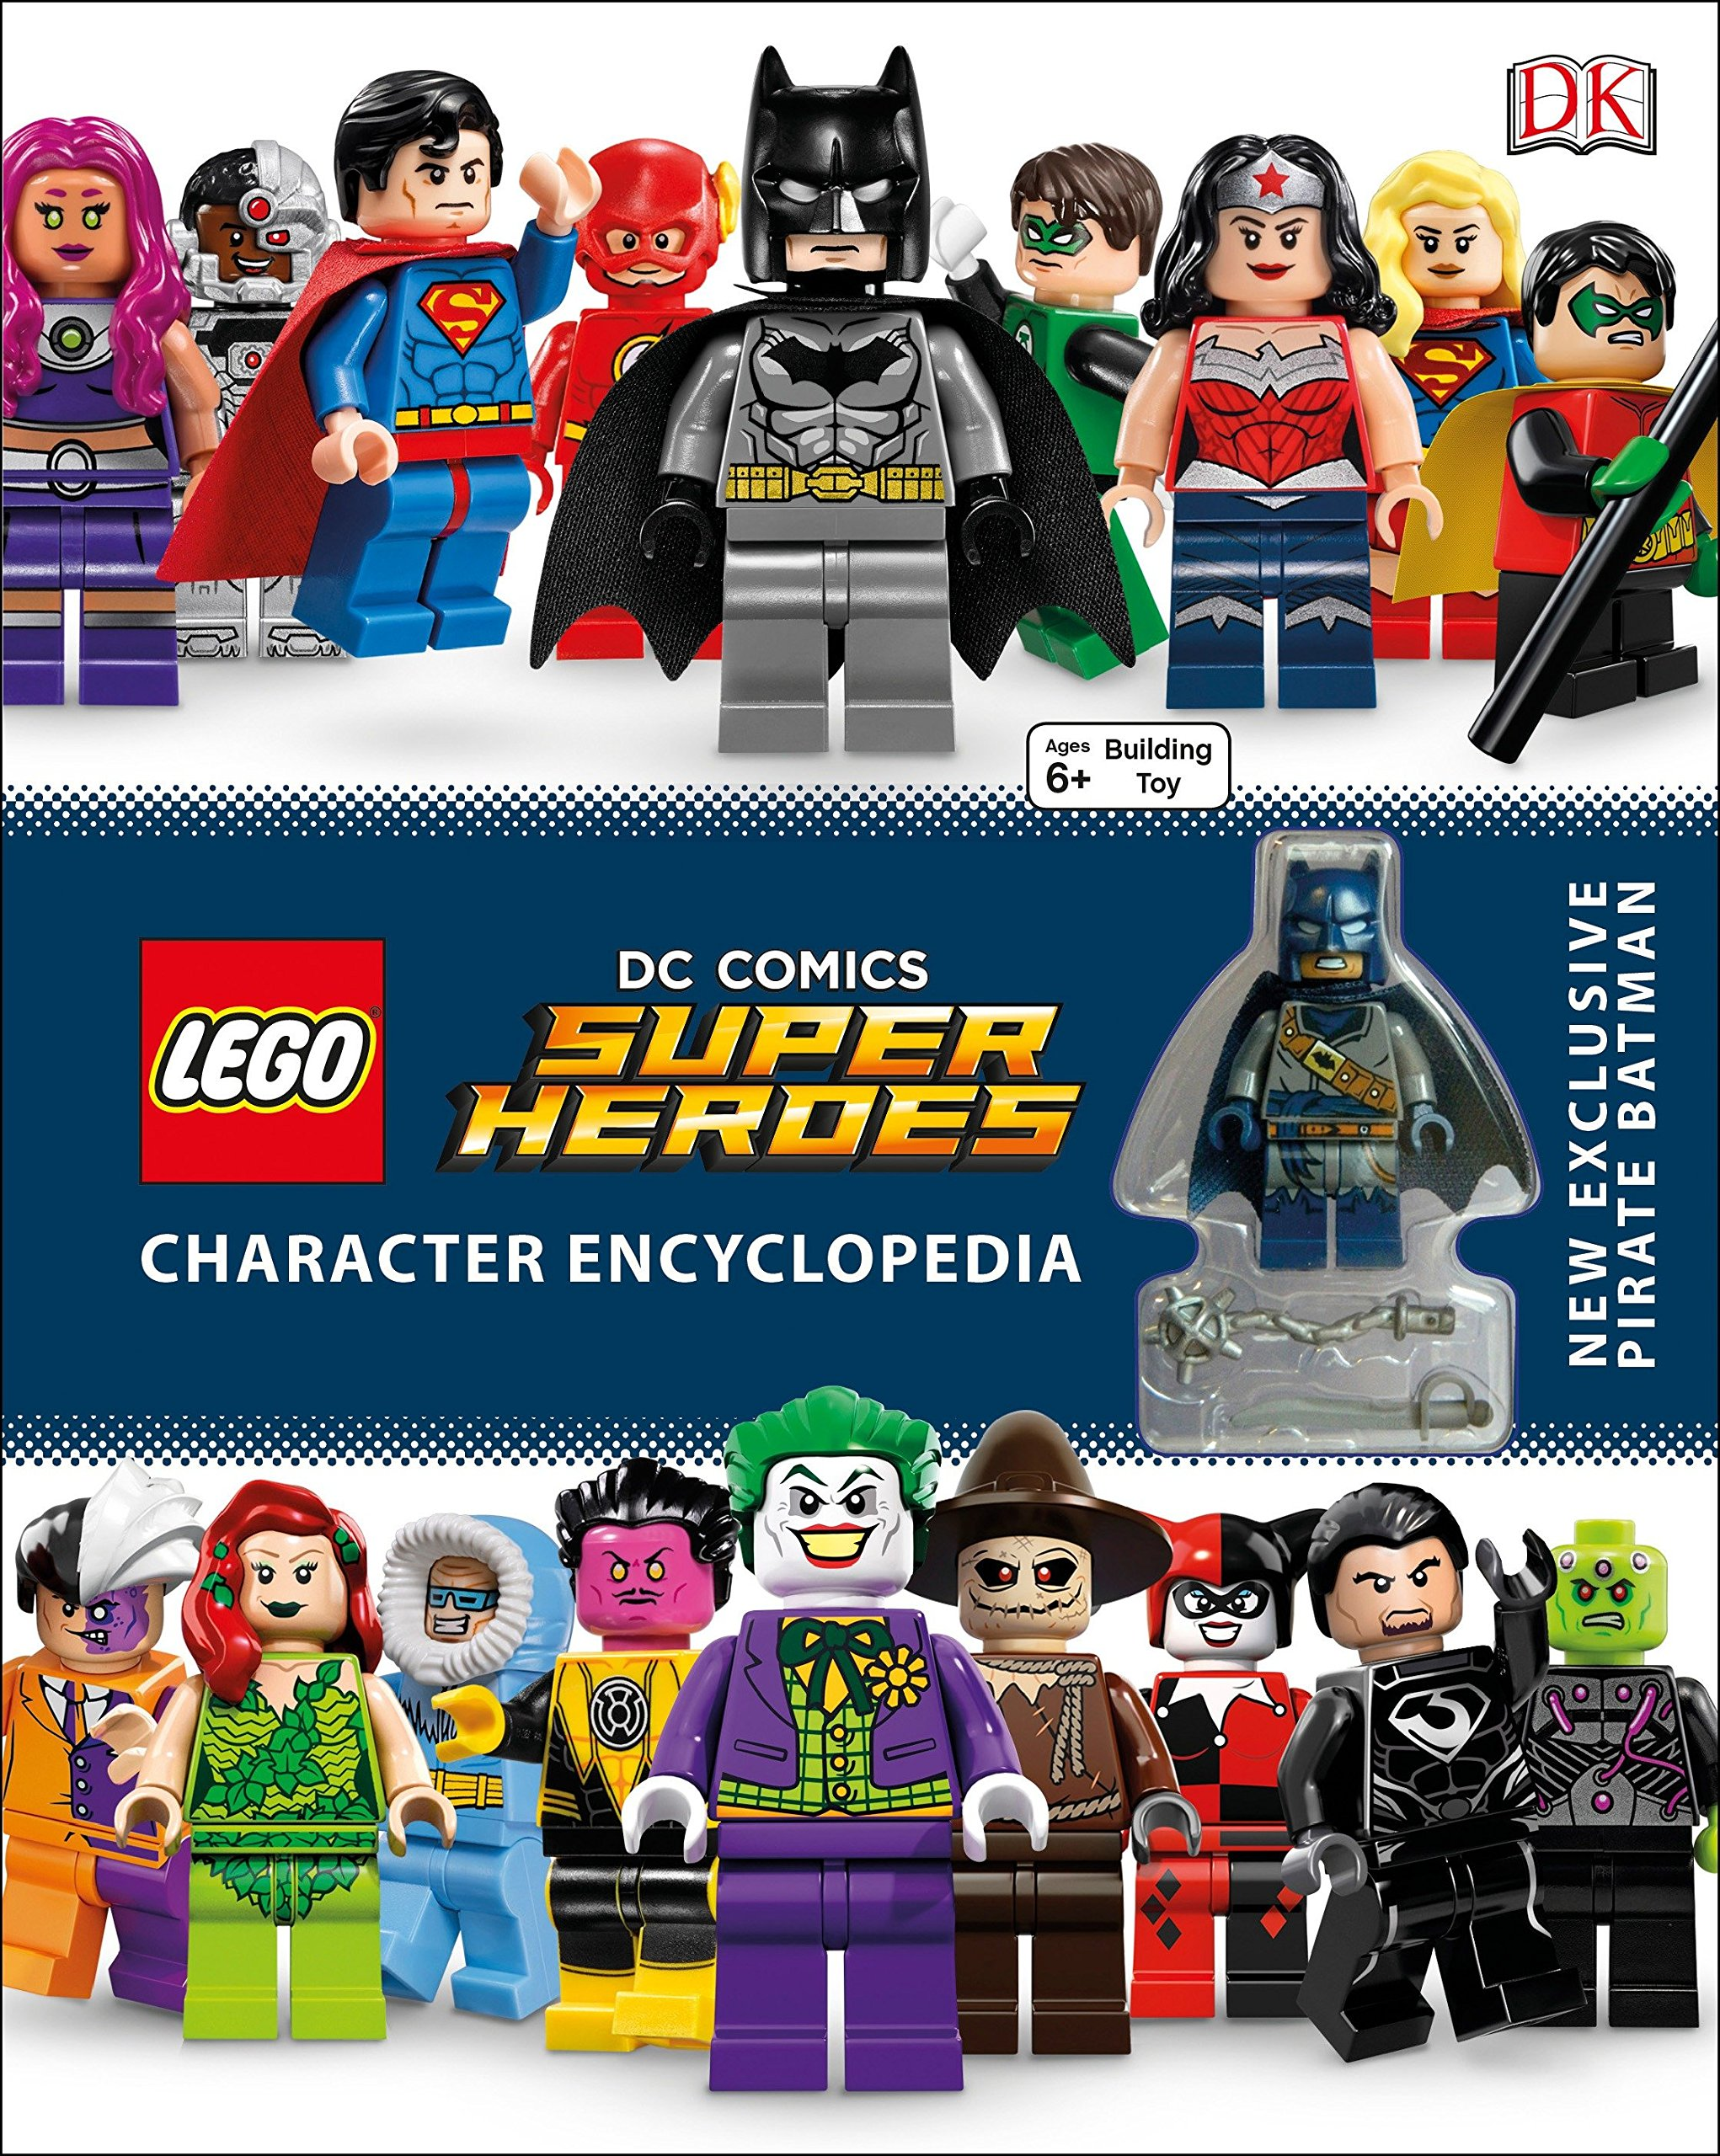 LEGO DC Comics Super Heroes Character Encyclopedia Hardcover – April 5, 2016 DK DK Children 1465444548 Media Tie-In